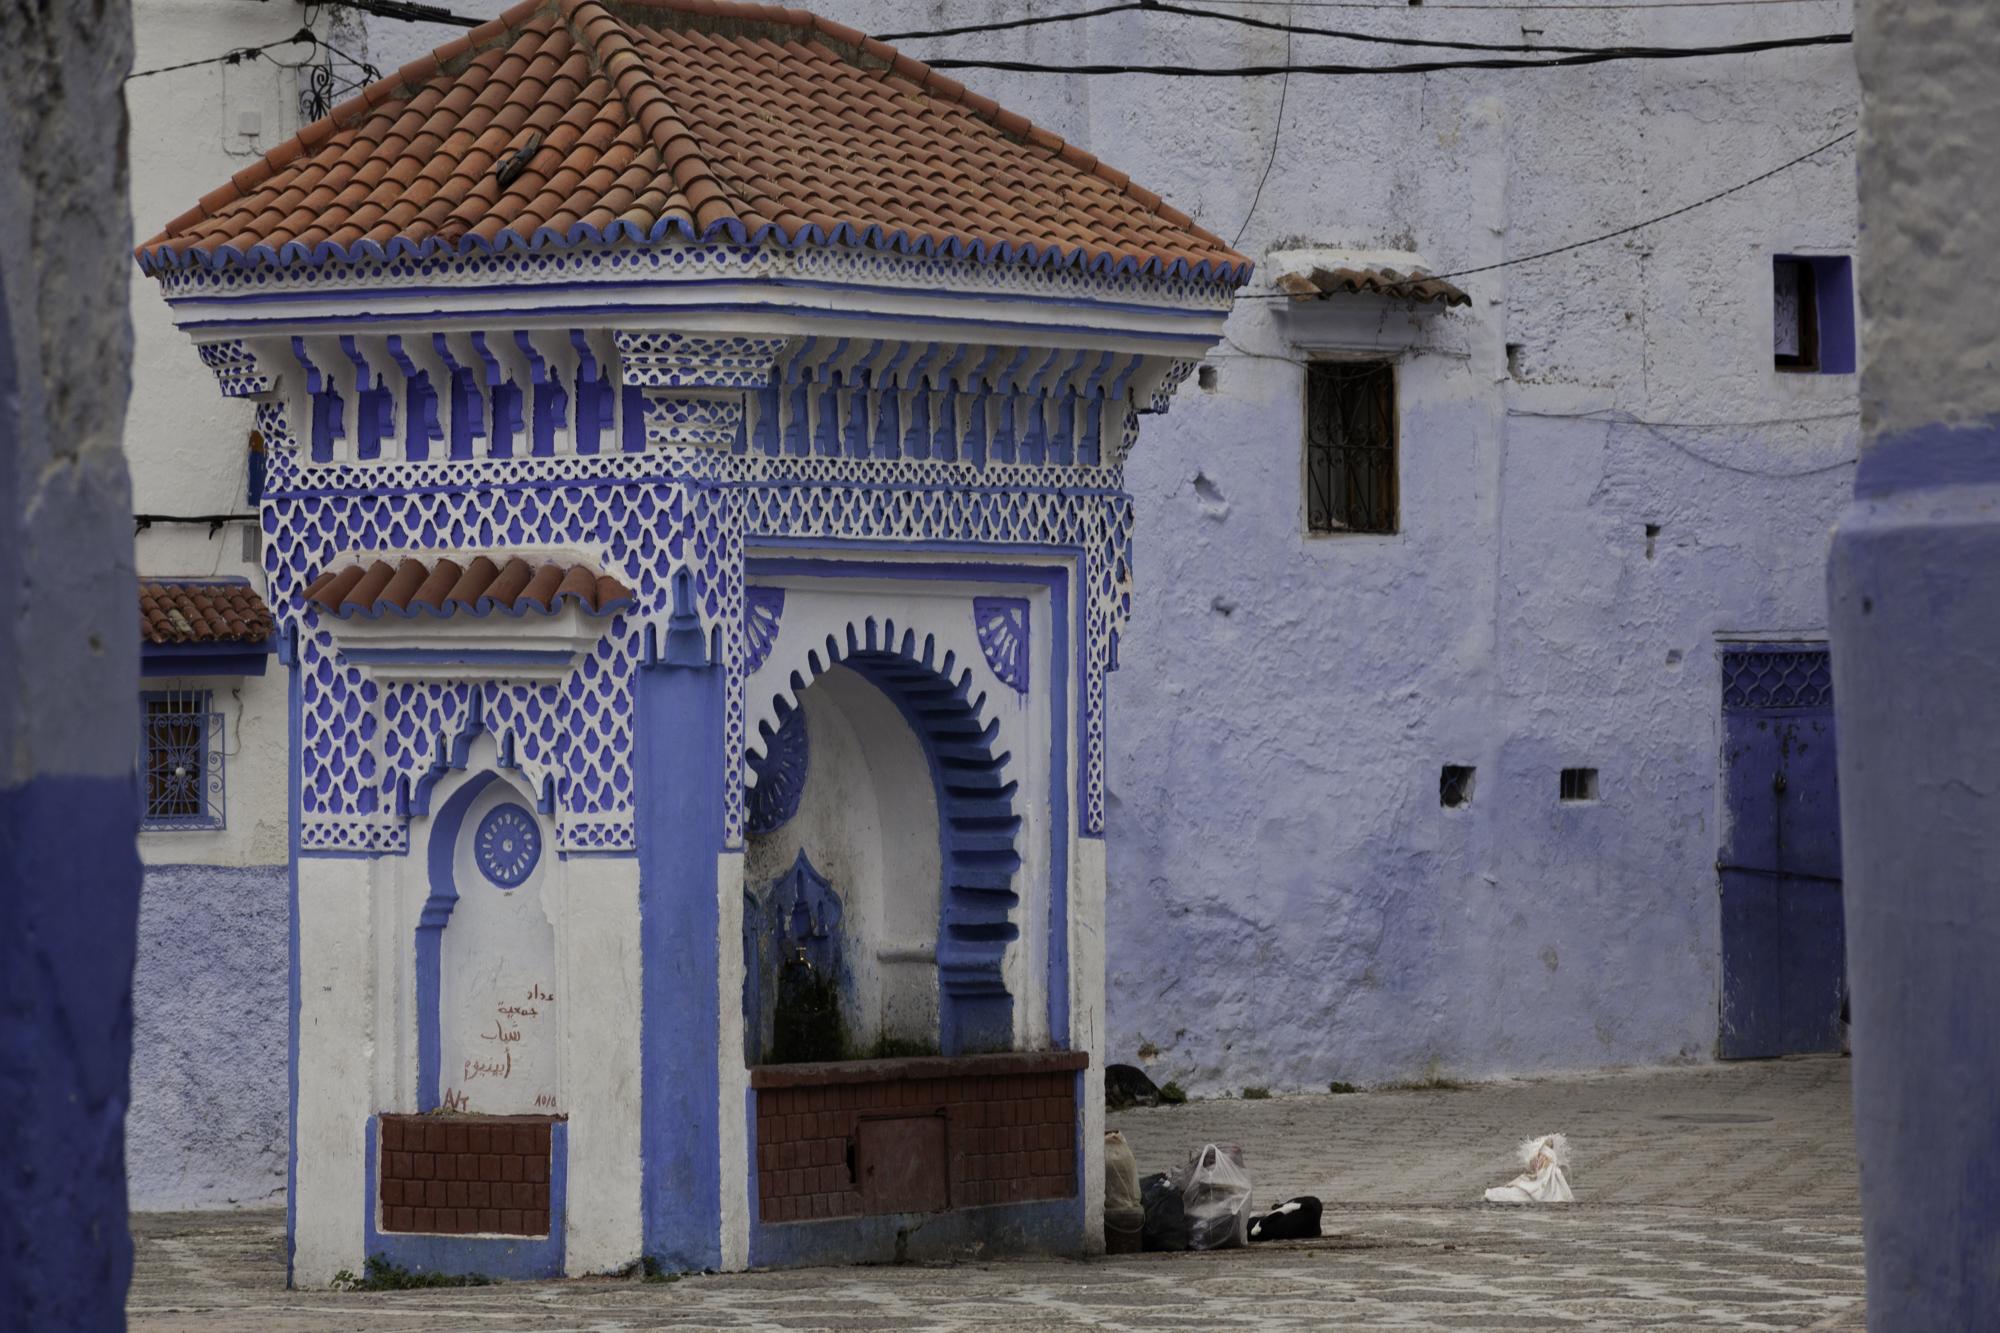 Morocco-2-12.jpg